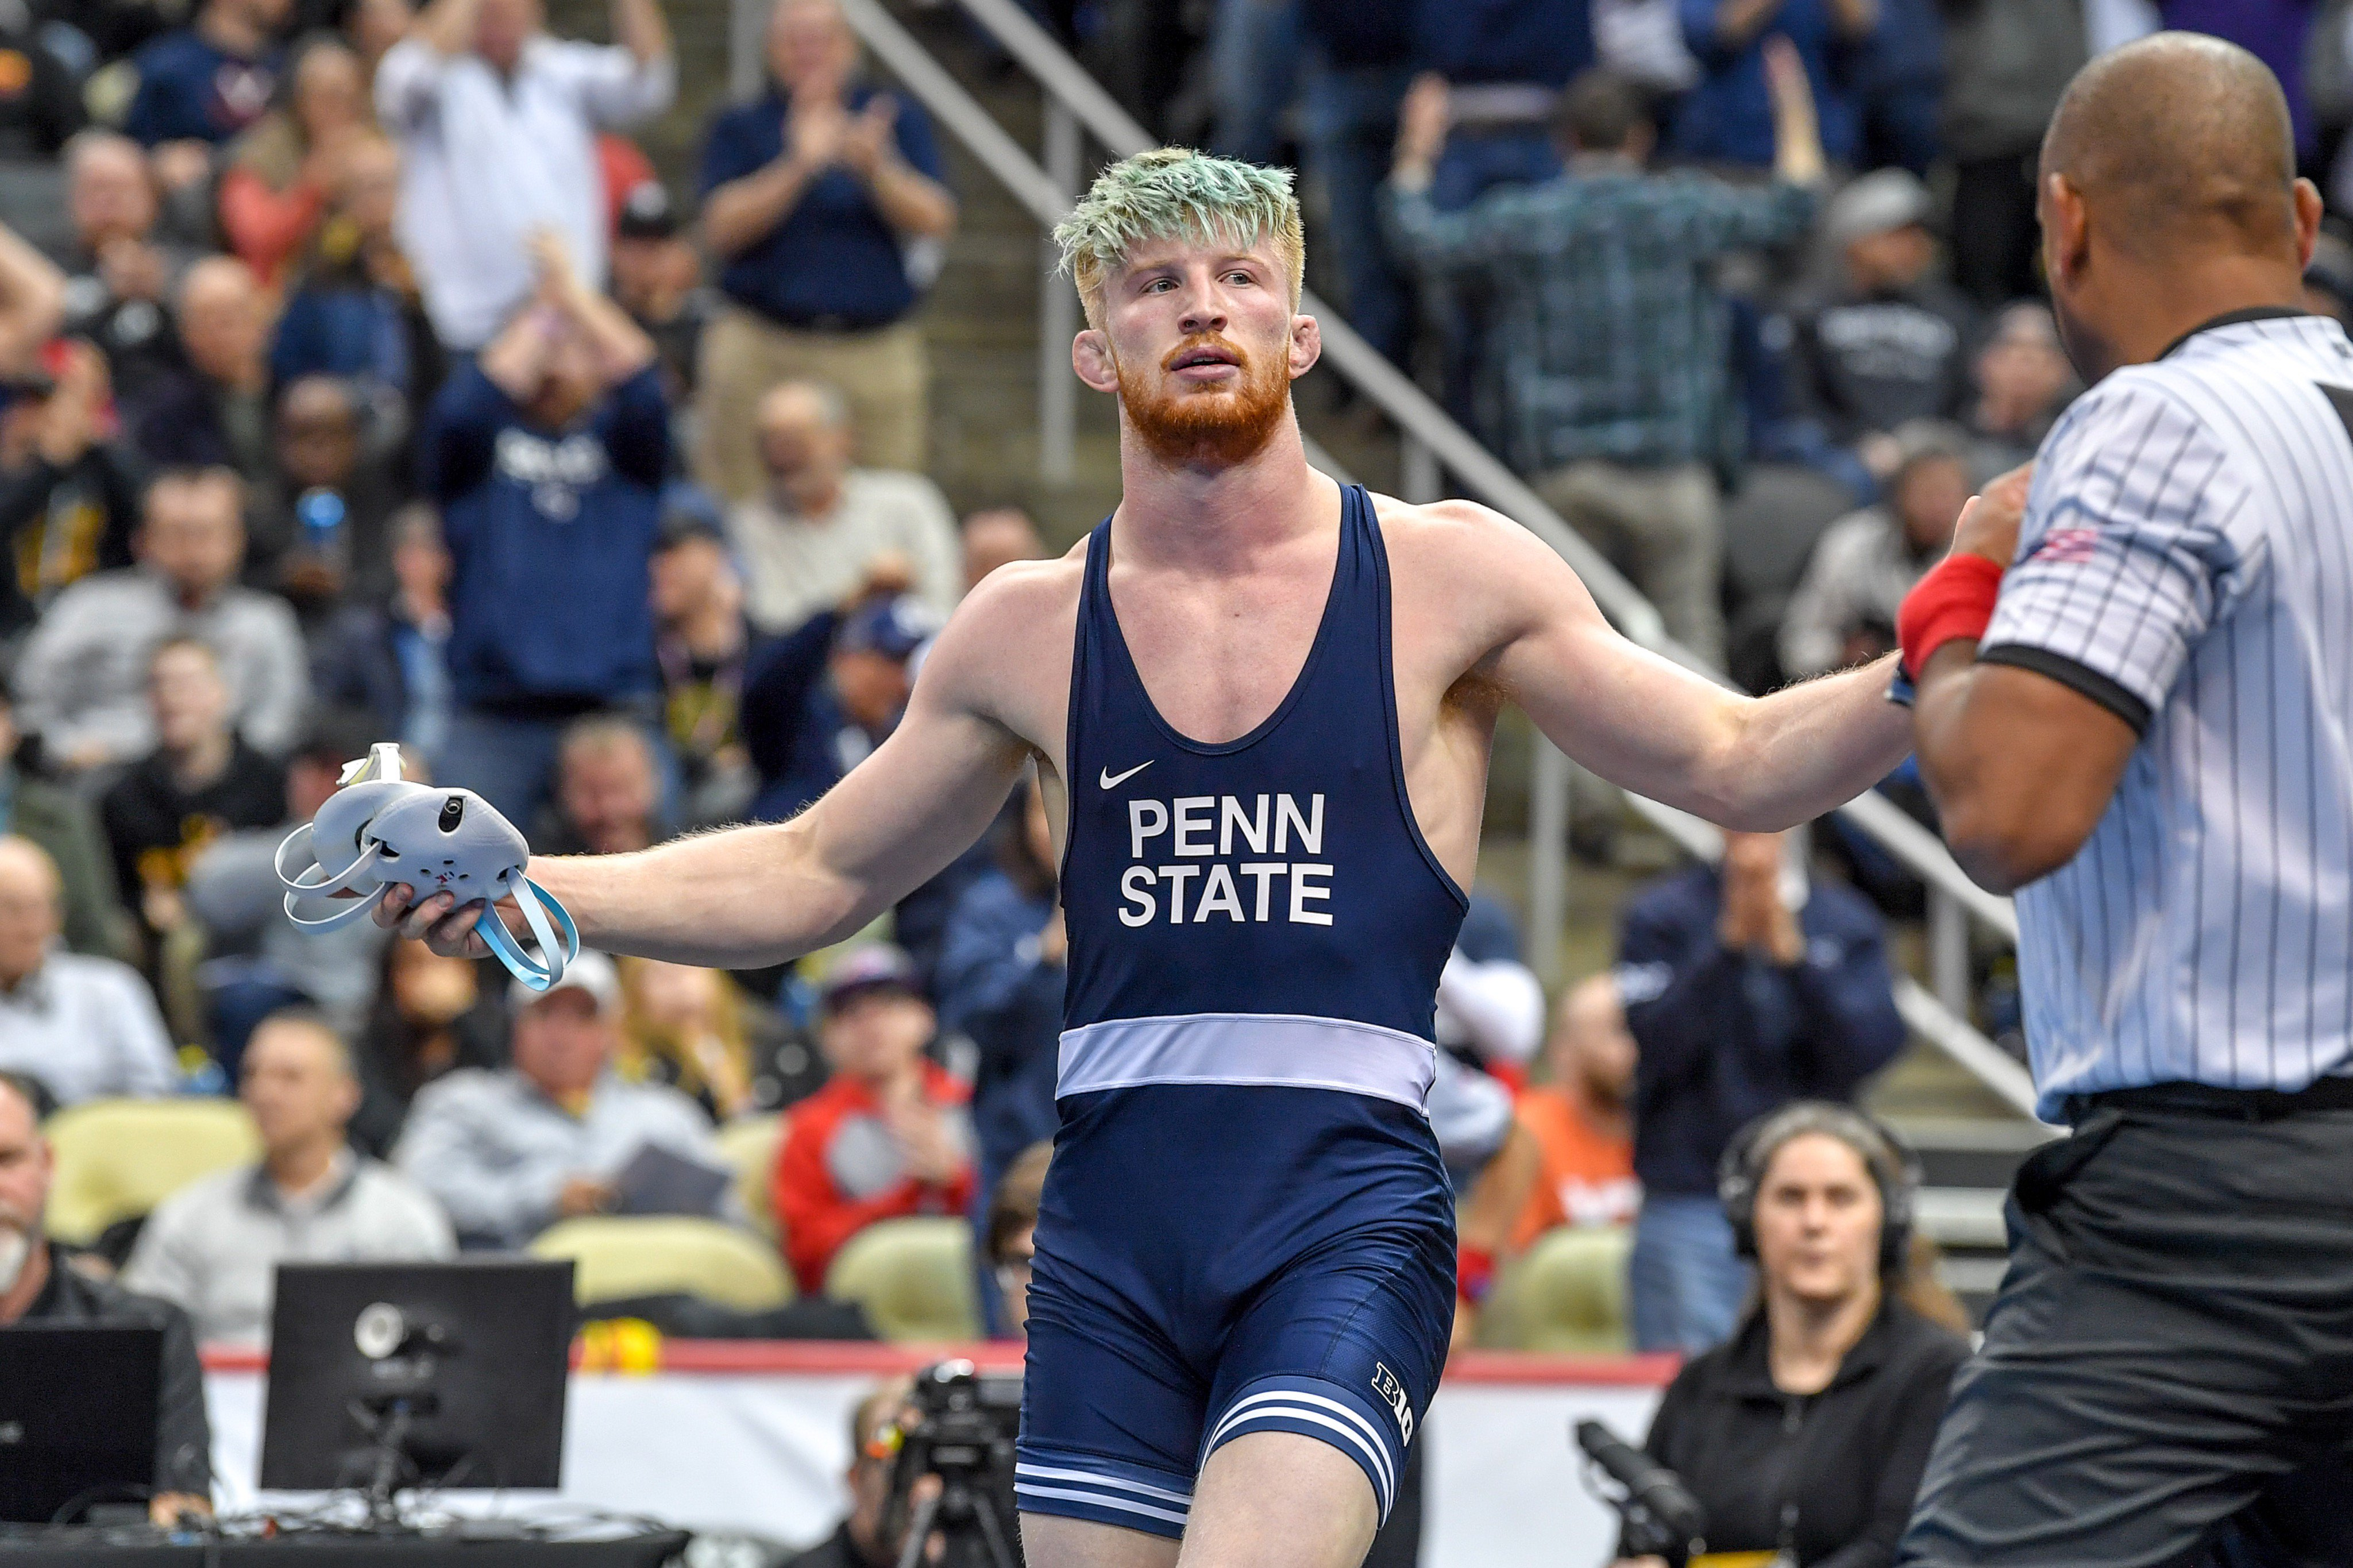 Penn State wrestling: Bo Nickal wins the Hodge Trophy